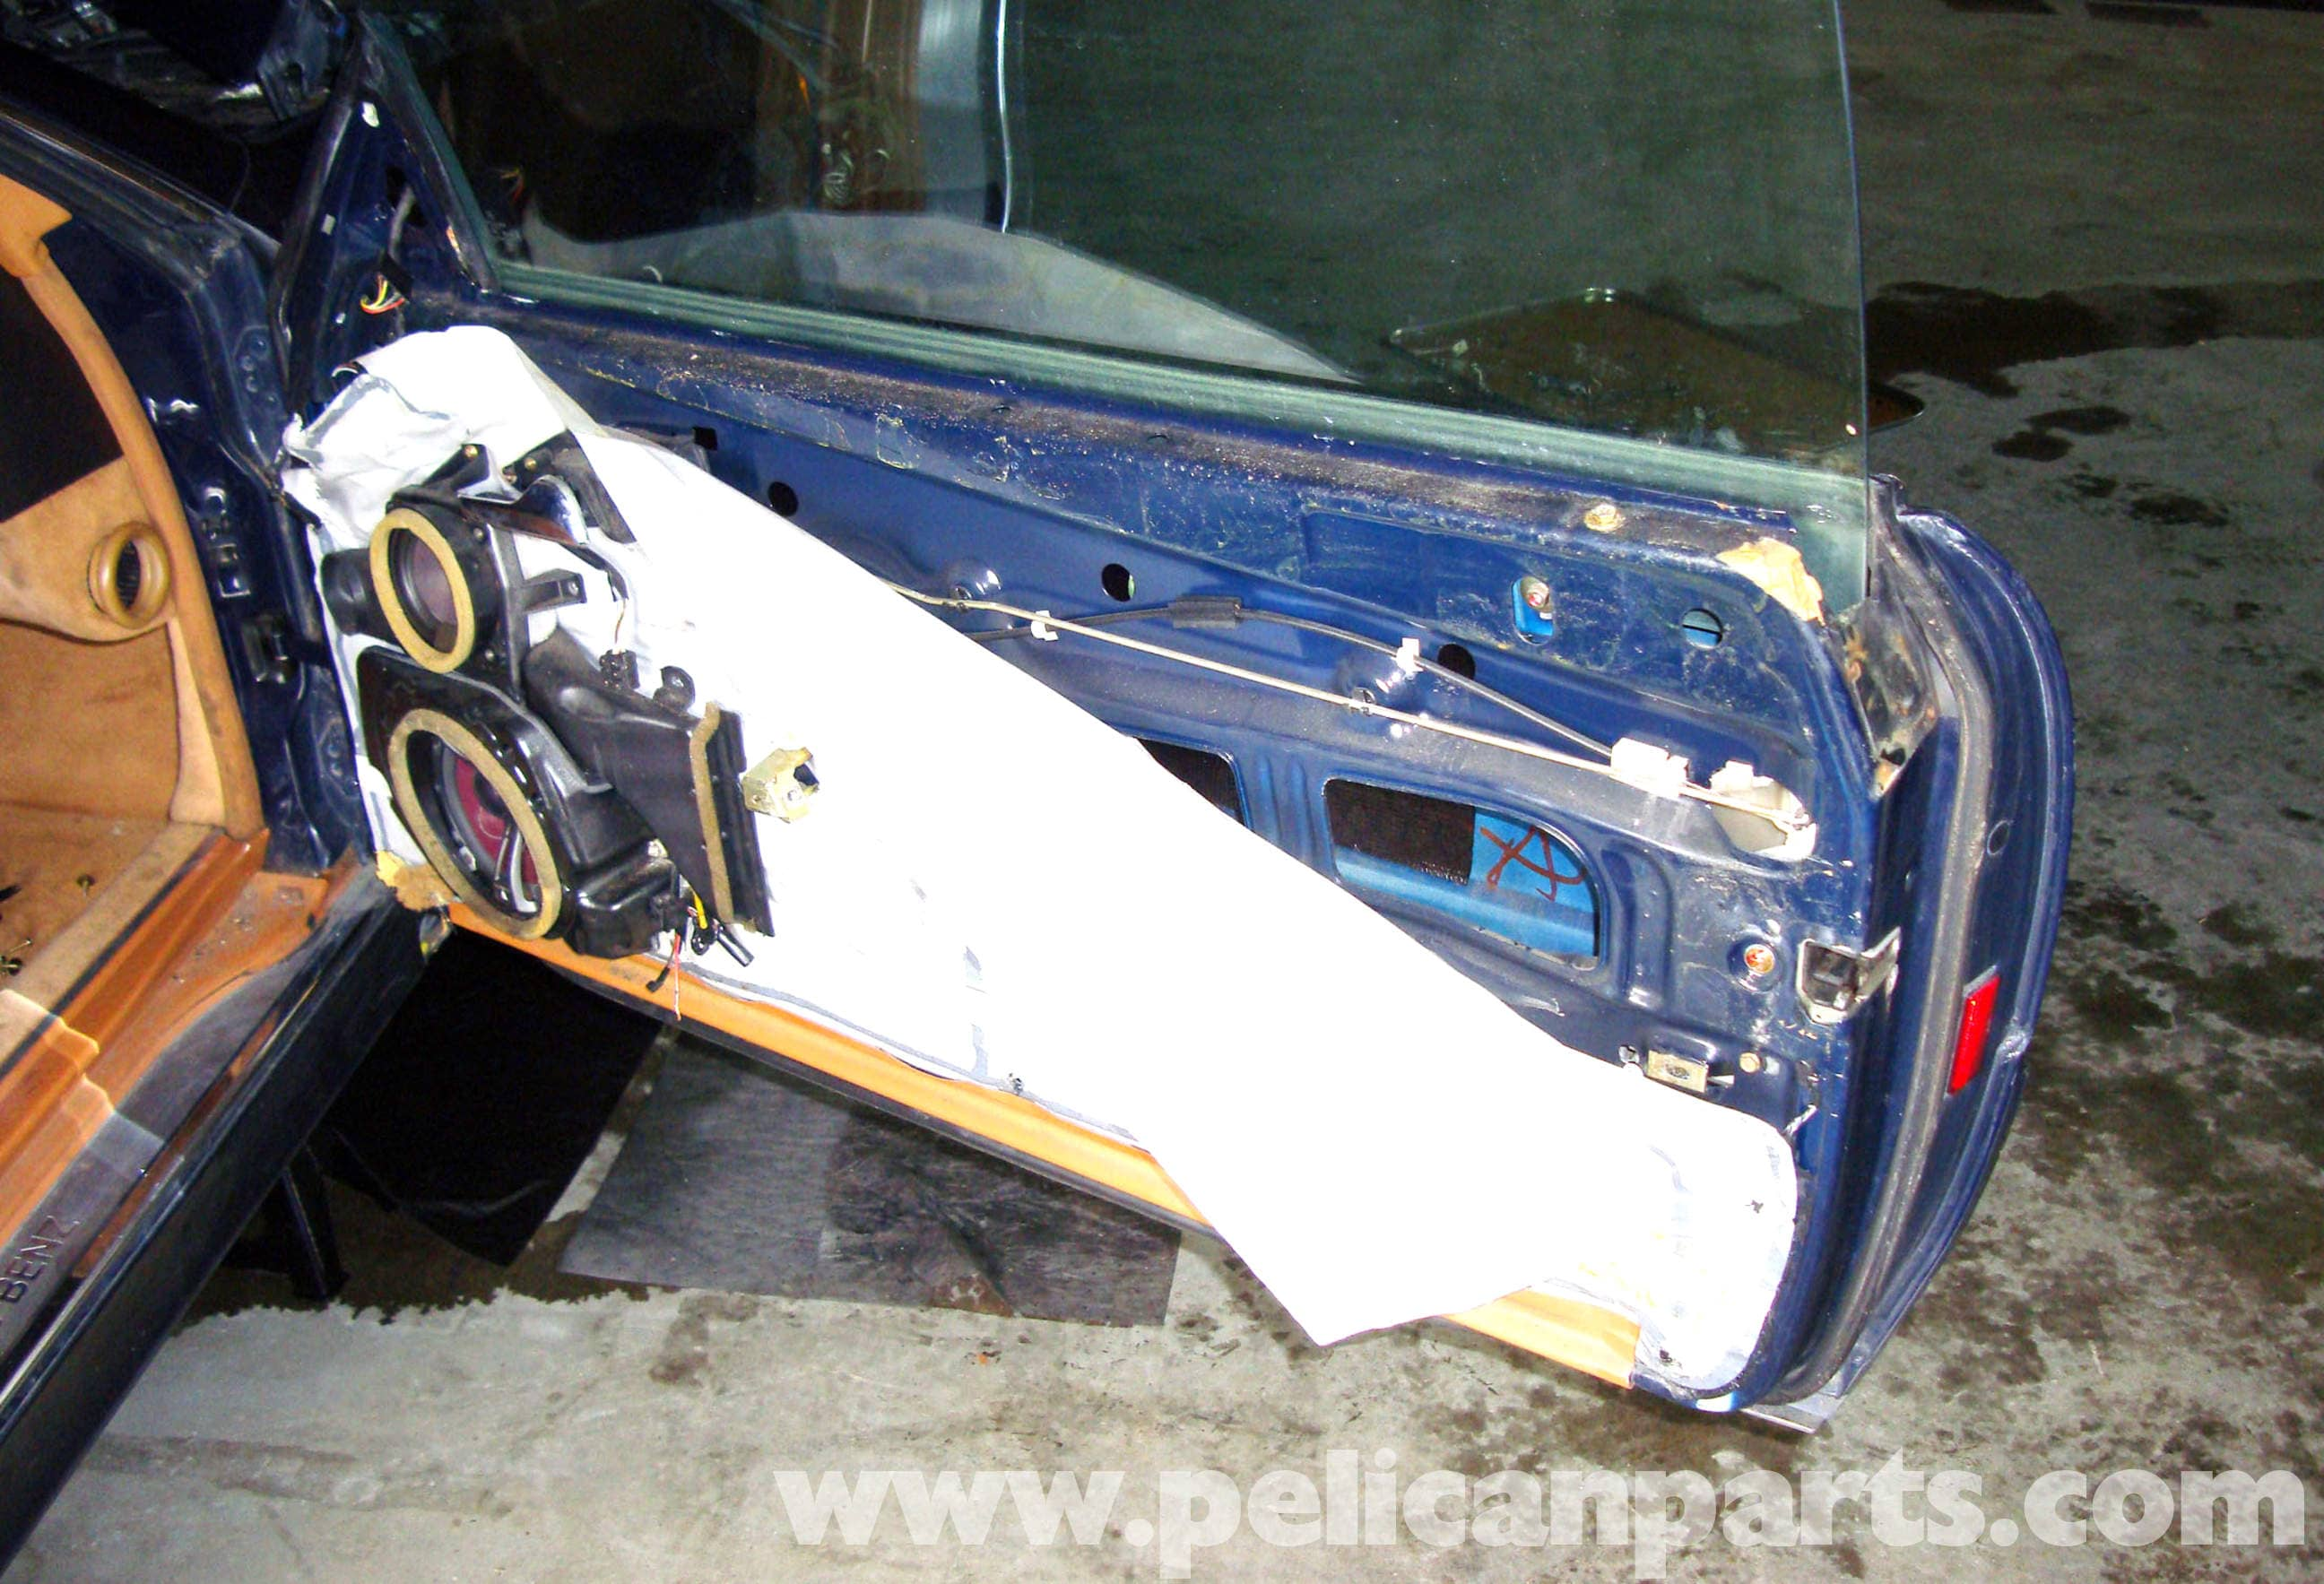 Mercedes-Benz R129 Power Window Removal - SL500, SL320 ... on